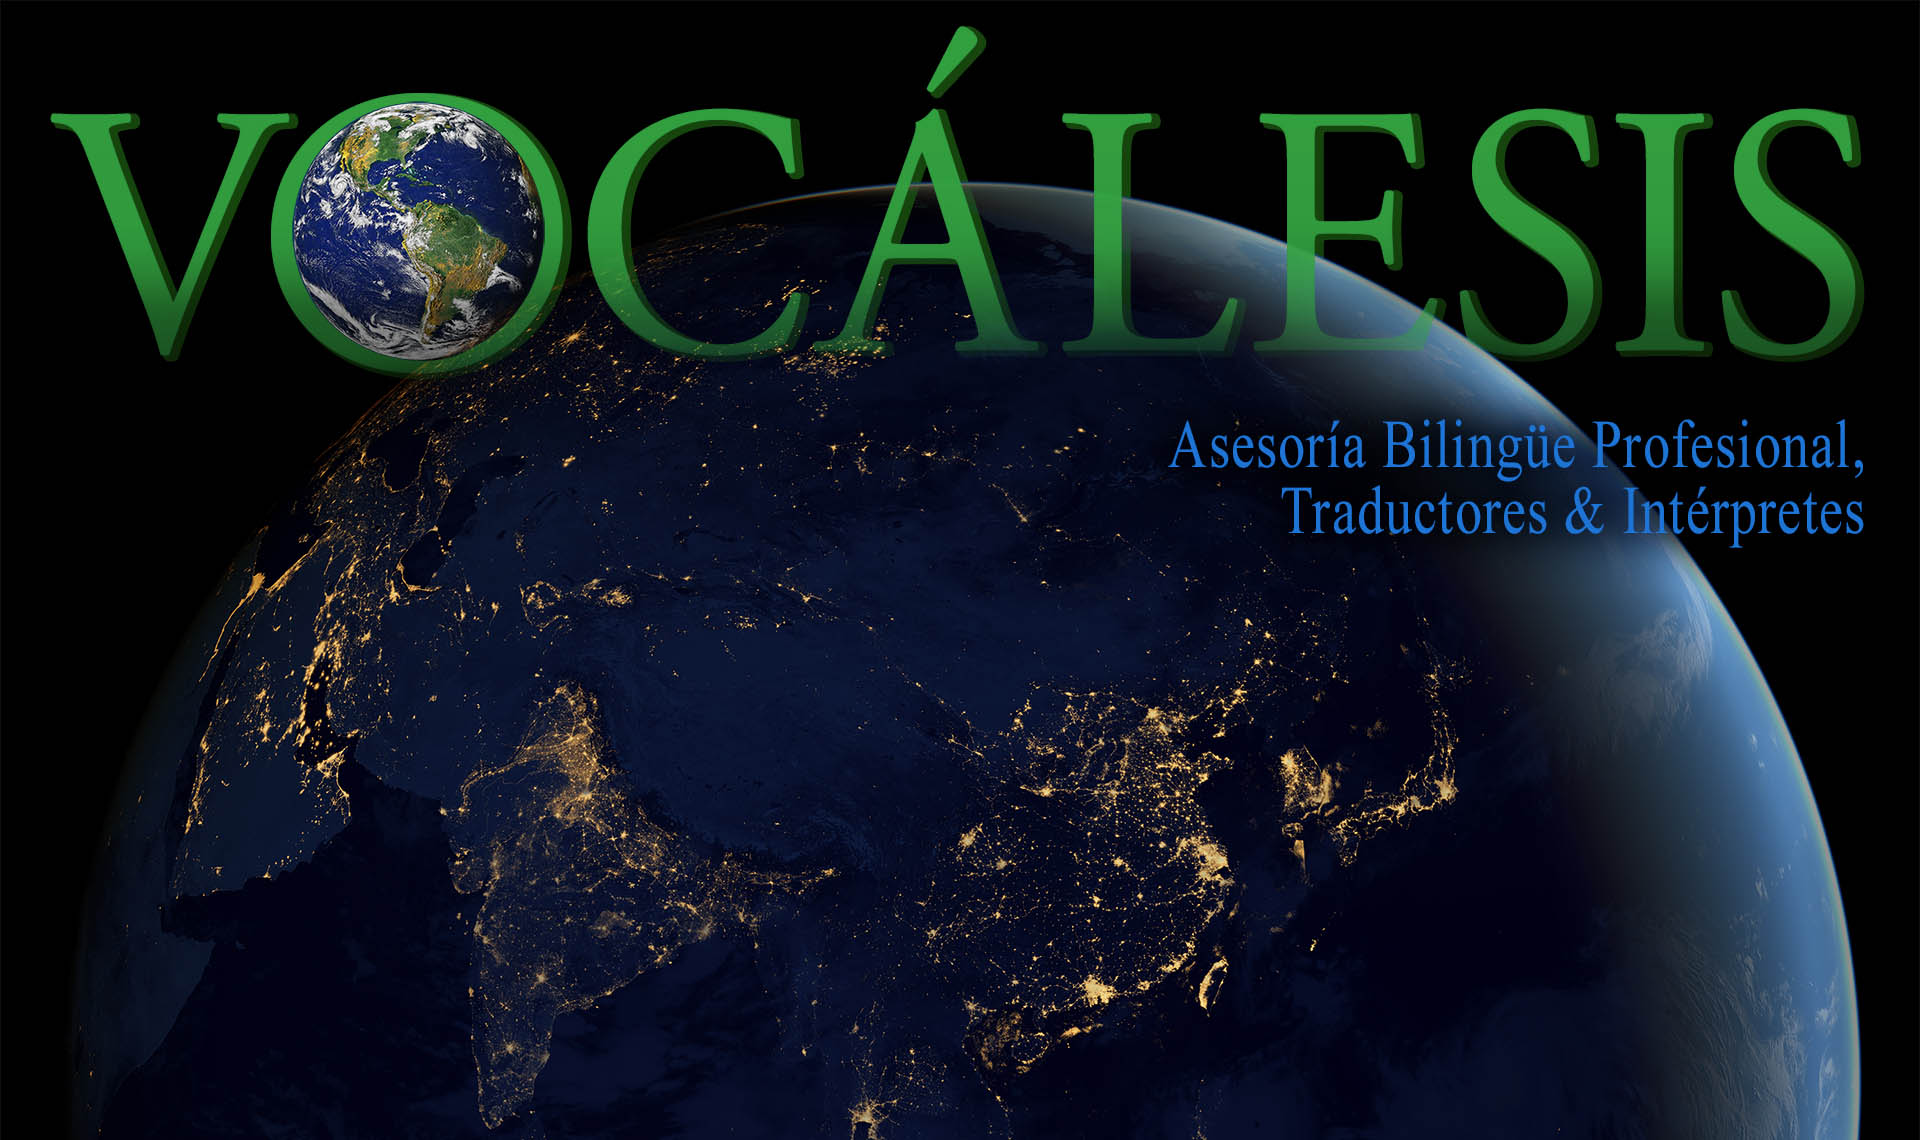 Vocalesis Header-Logo-Marble-02-Asia